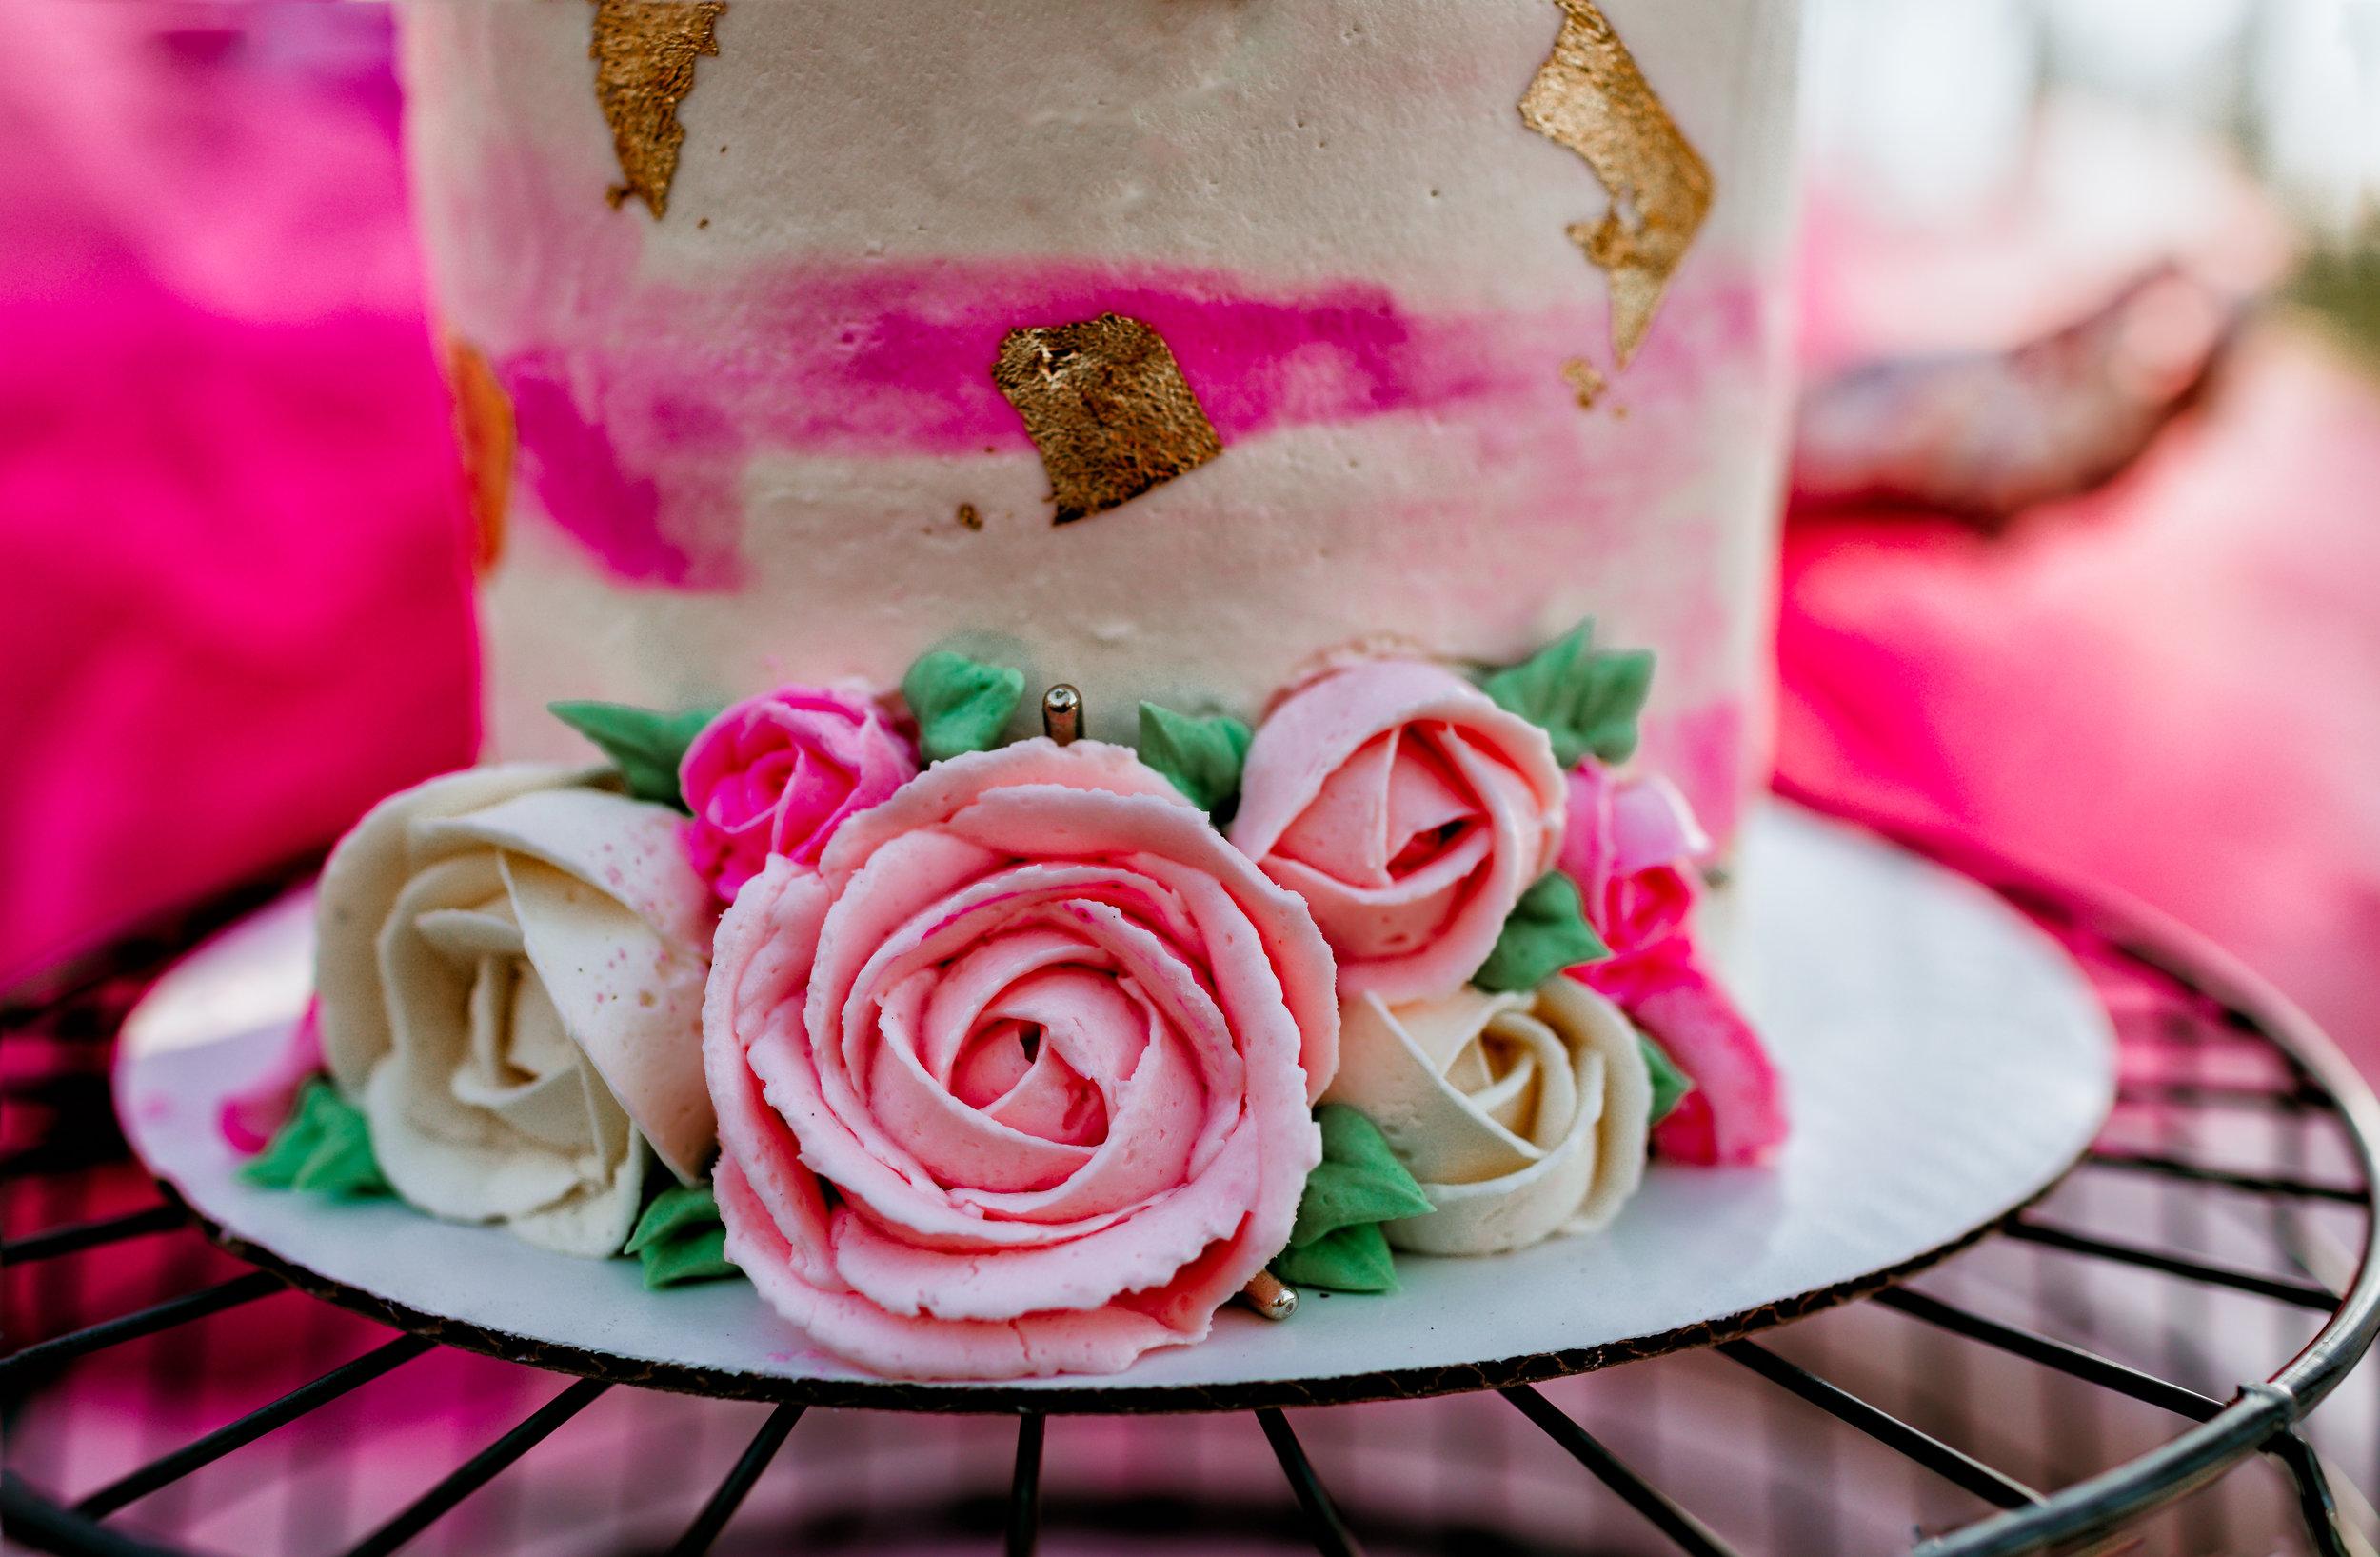 austin-minnesota-albert-lea-southern-minnesota-photography-portrait-cake-smash-30th-birthday